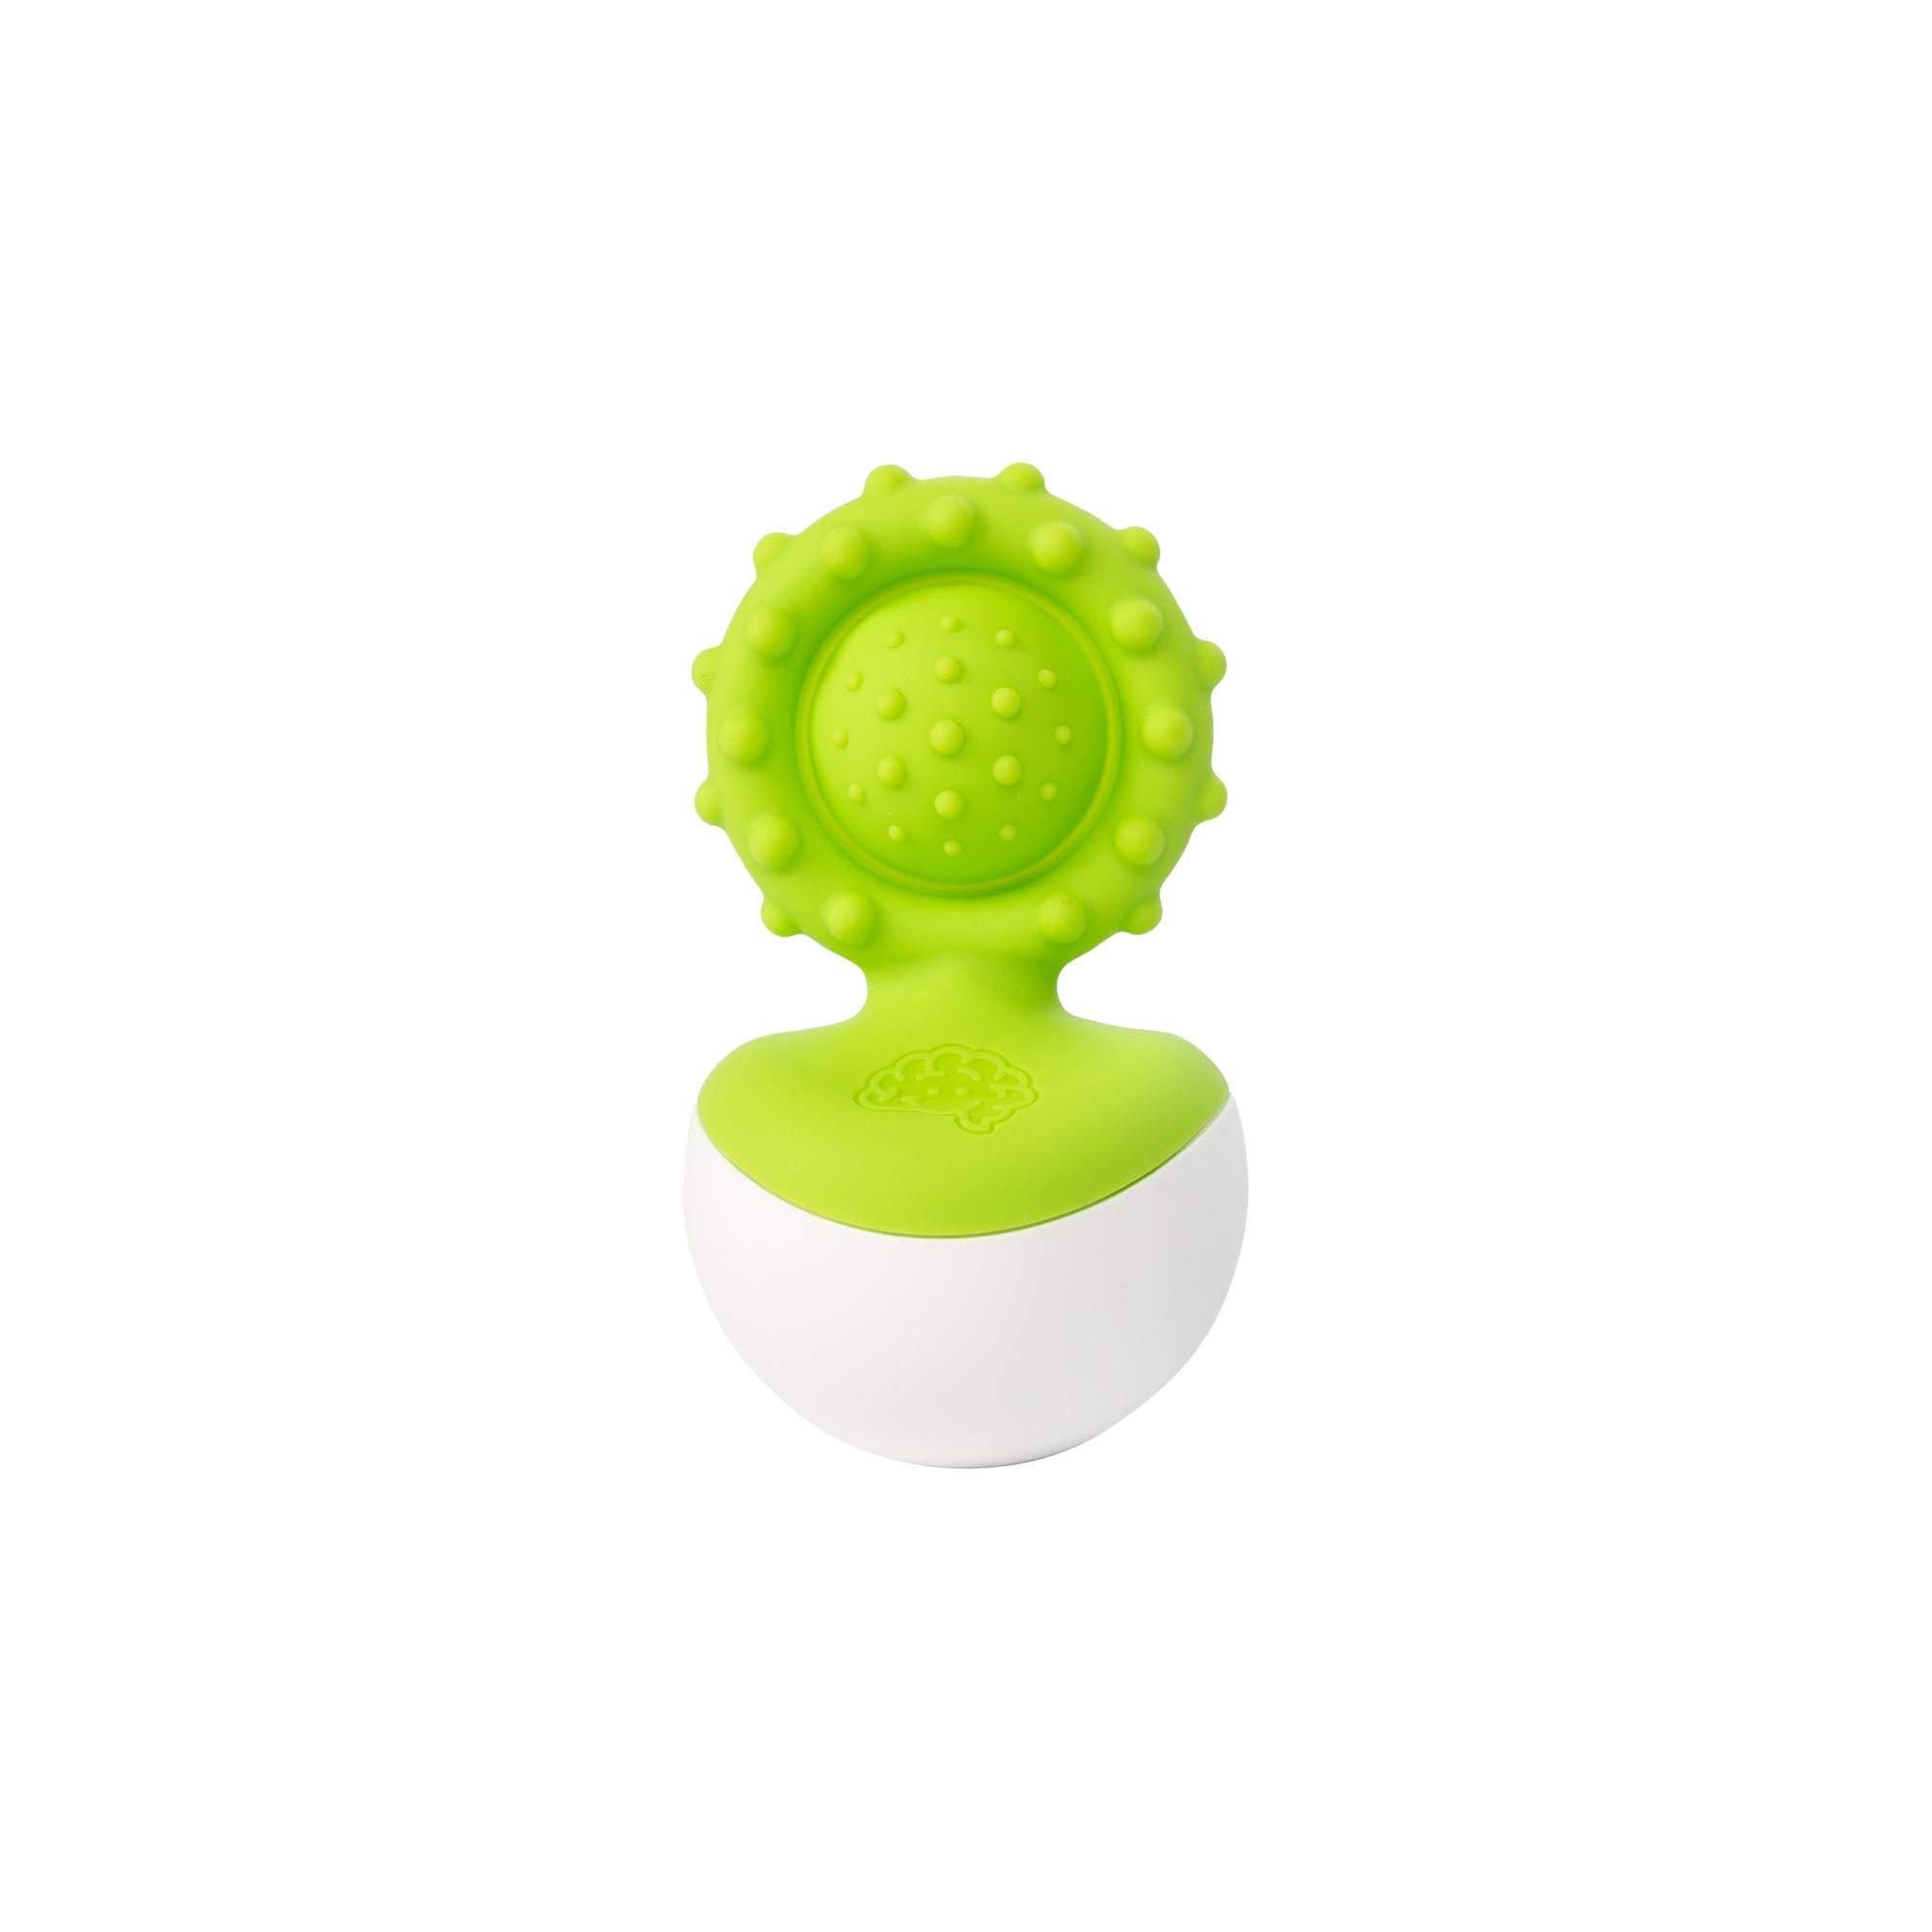 Fat Brain Toys Dimpl Wobbl Green Teether (1)